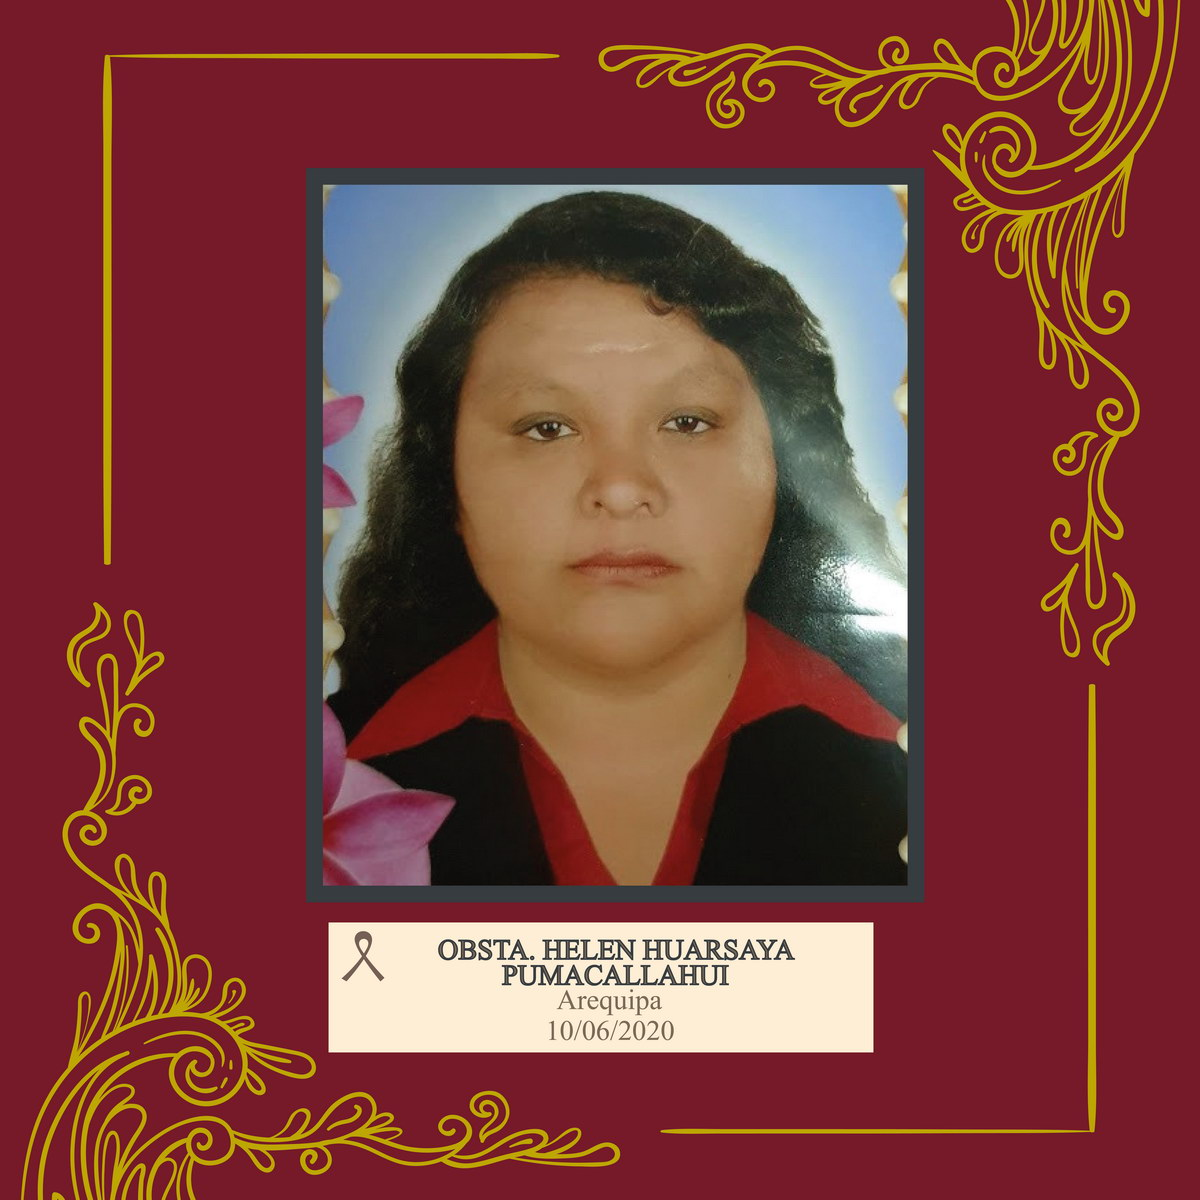 Helen Paola Huarsaya Pumacallahui